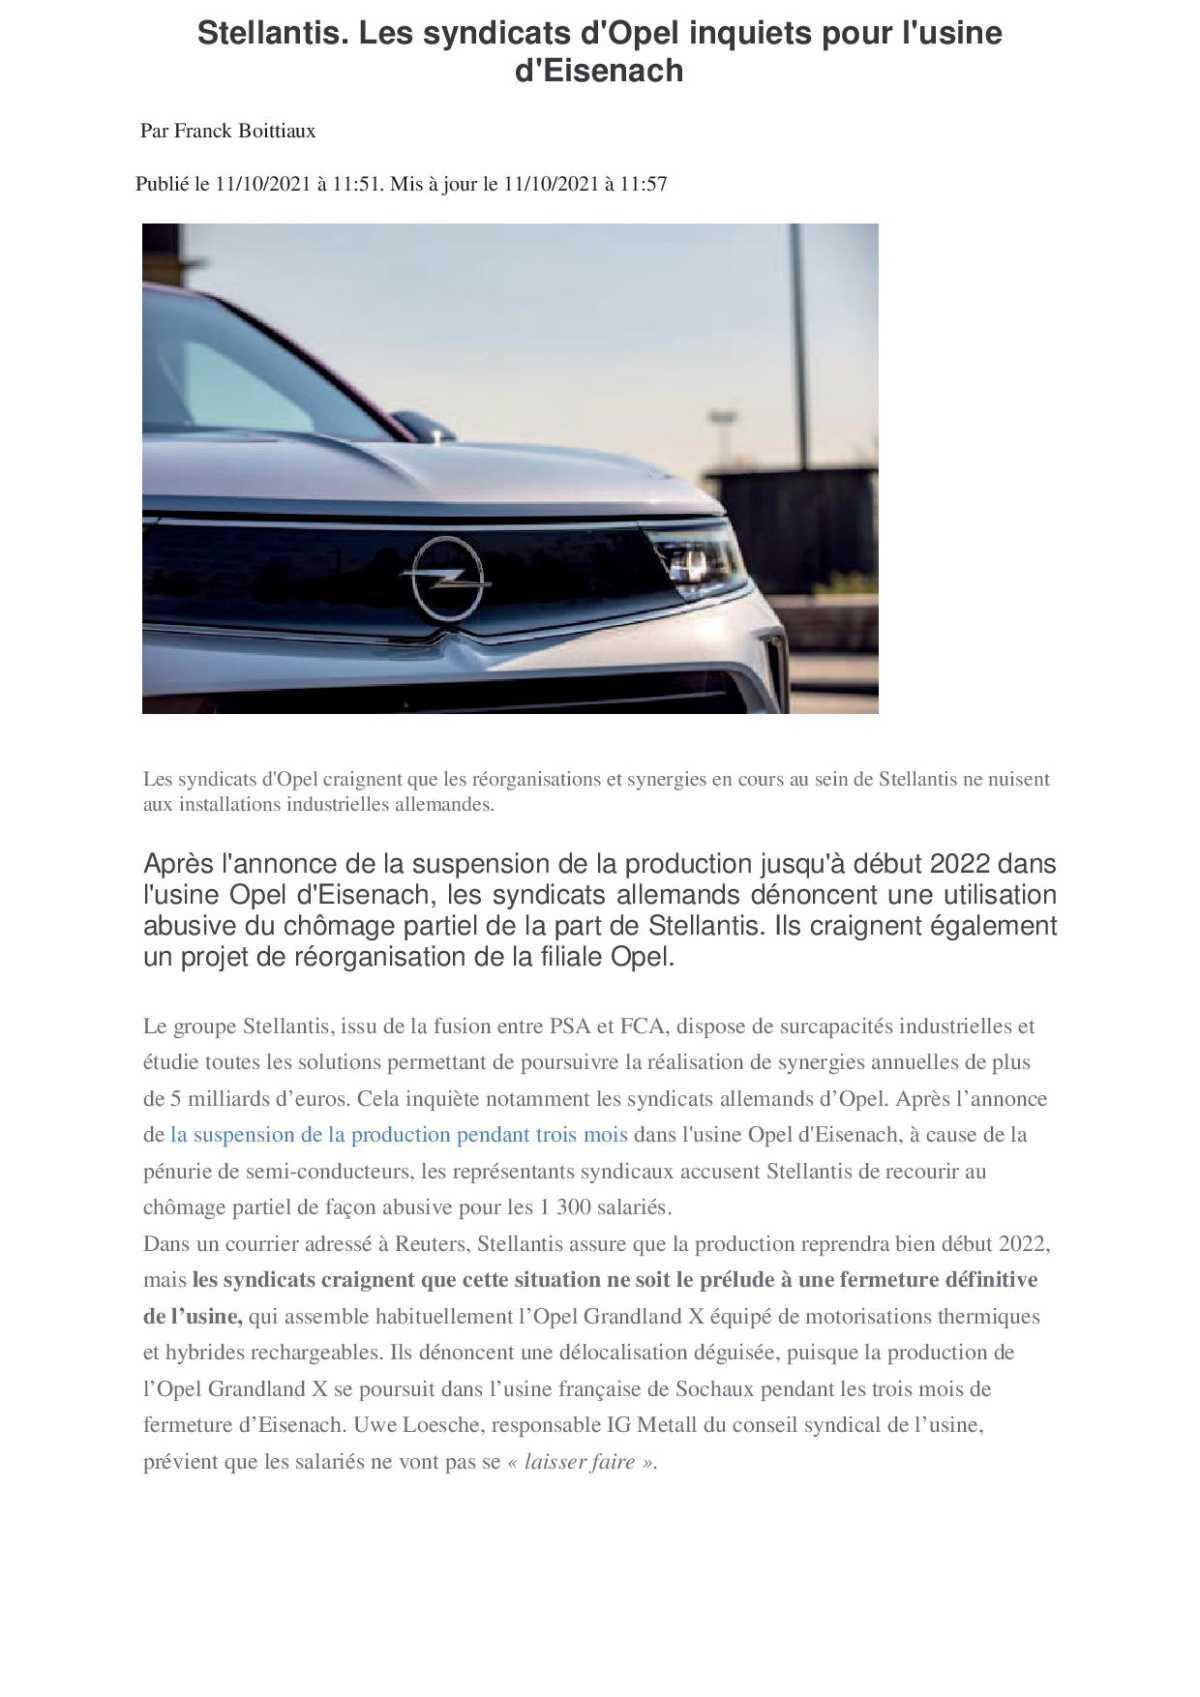 Opel inquiet pour Eisenach..